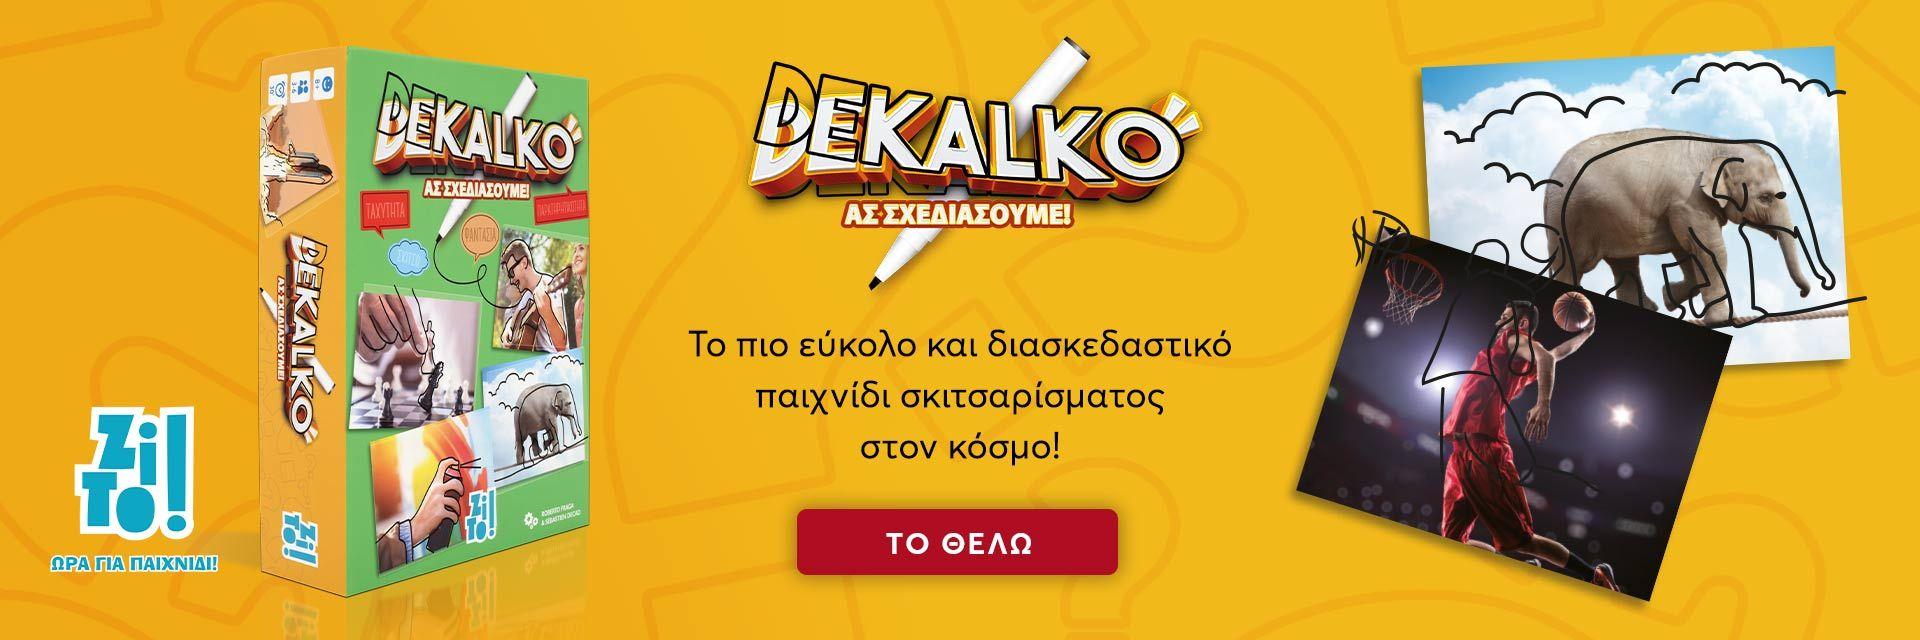 ZITO!- DEKALKO